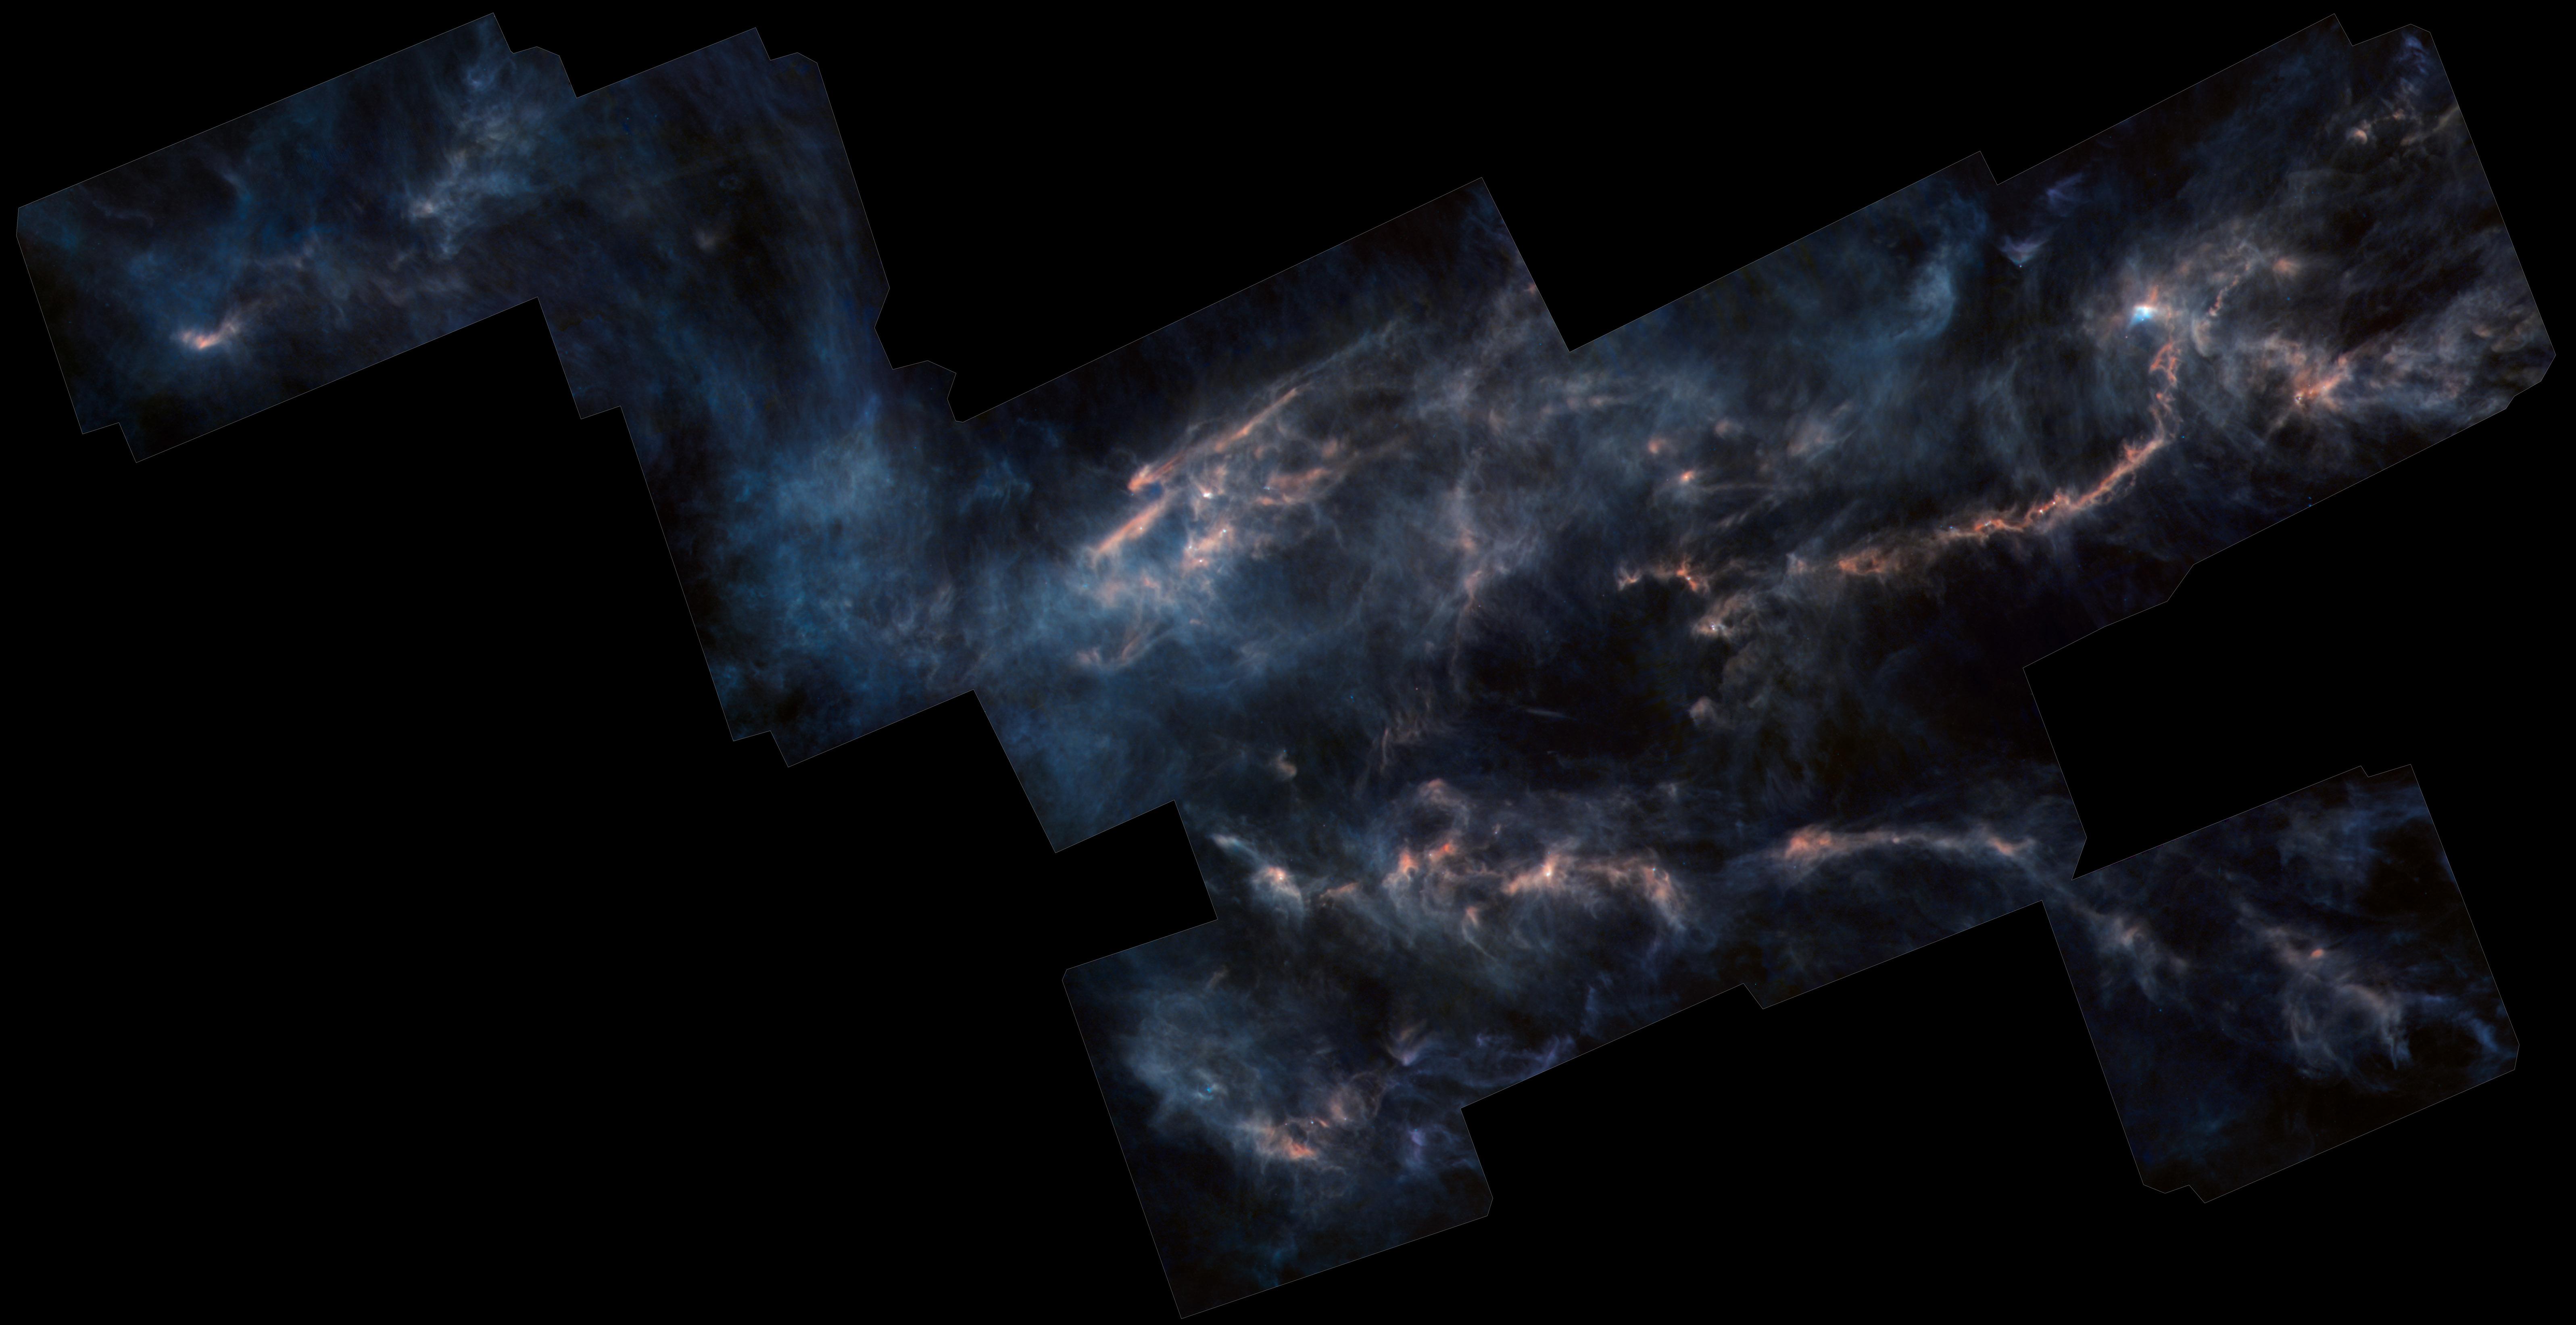 1567214438670-Herschel_Taurus_PACS-SPIRE.jpg